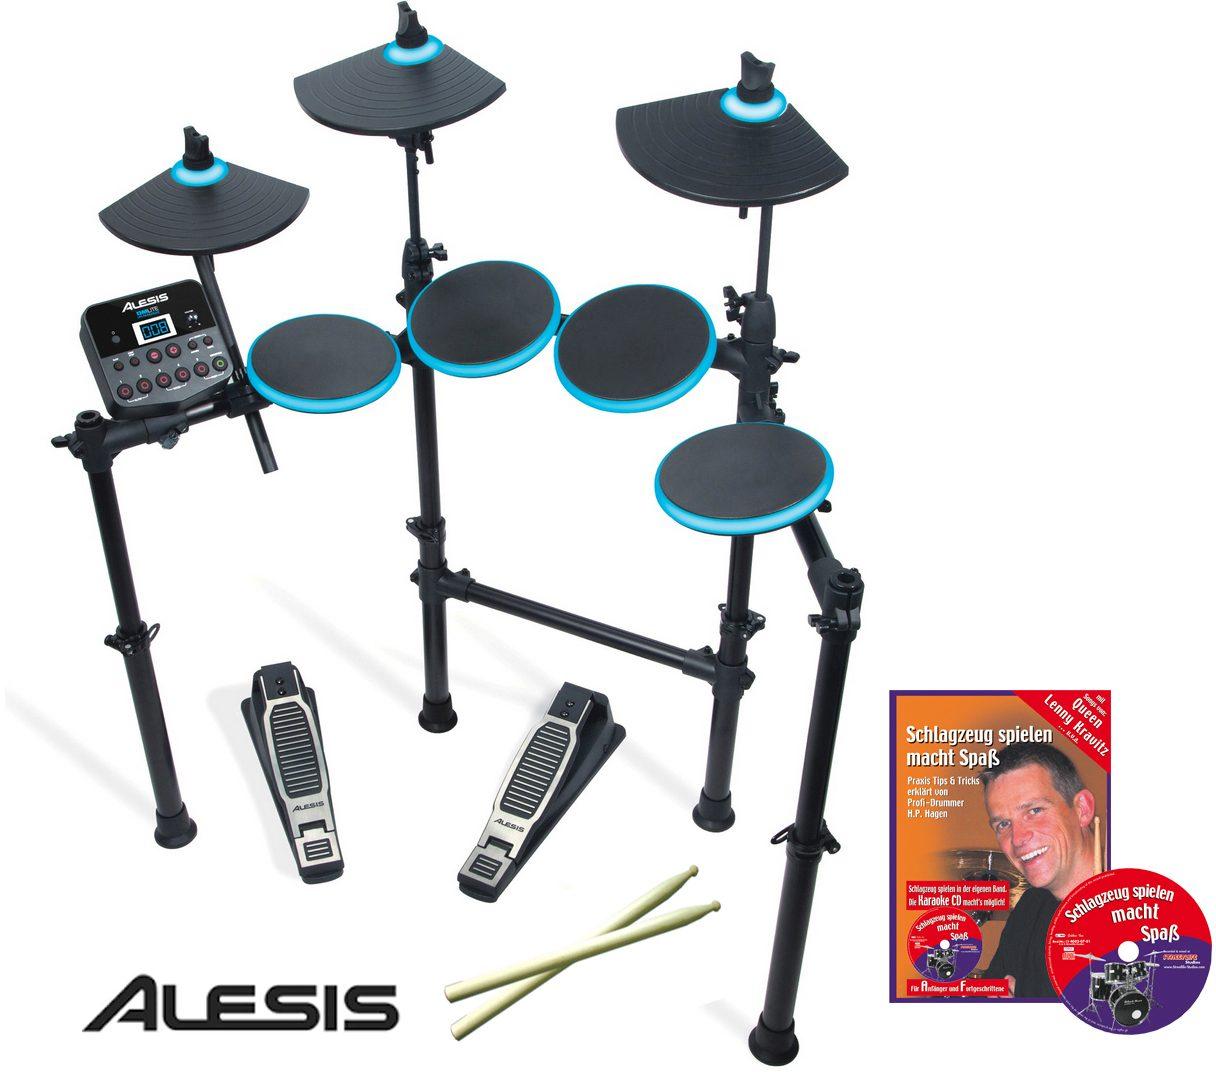 Clifton Alesis Elektronisches Schlagzeug, »E-Drum Set DM Lite Alesis«